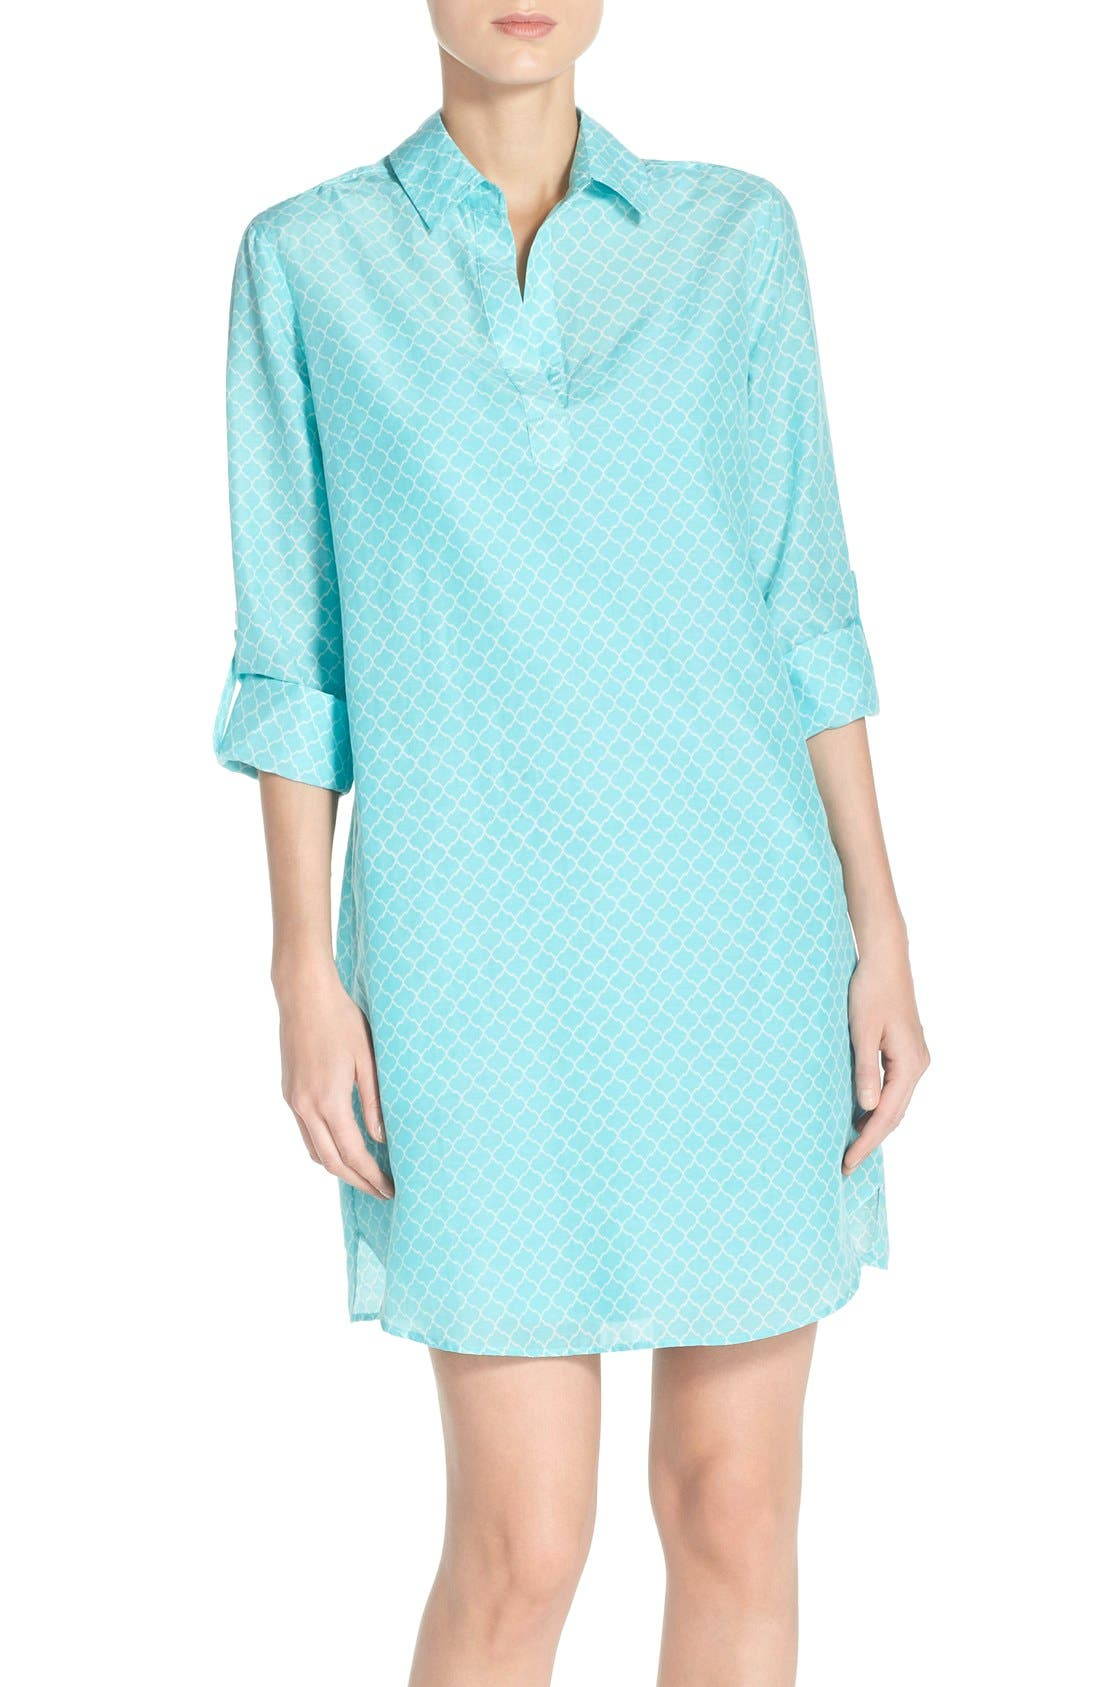 Main Image - KUT from the Kloth Print Chambray Shirtdress